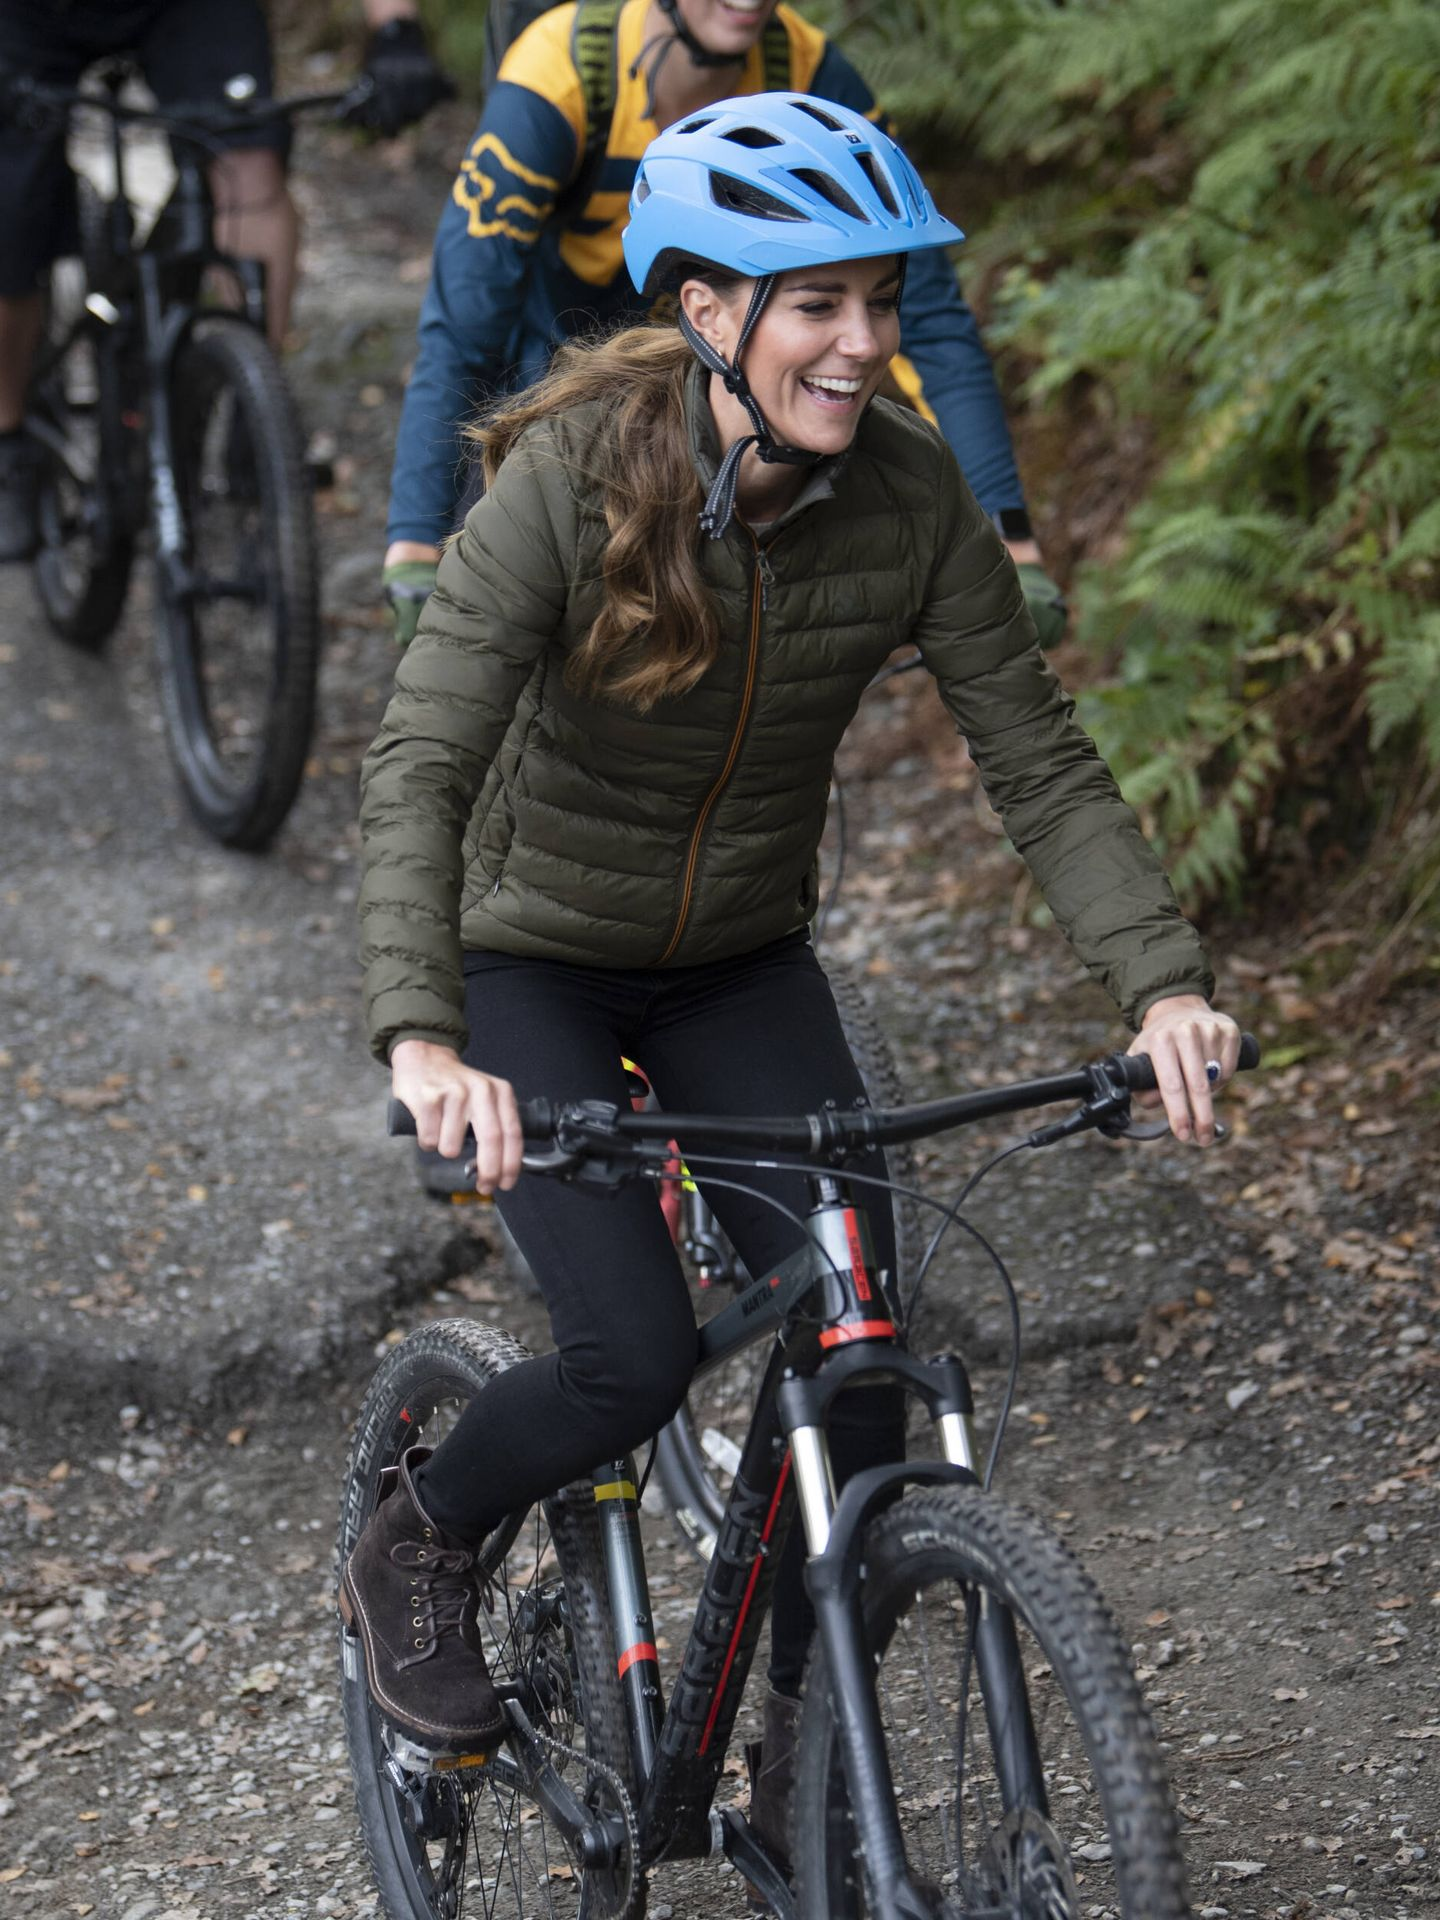 La duquesa de Cambridge, en bicicleta. (Getty)